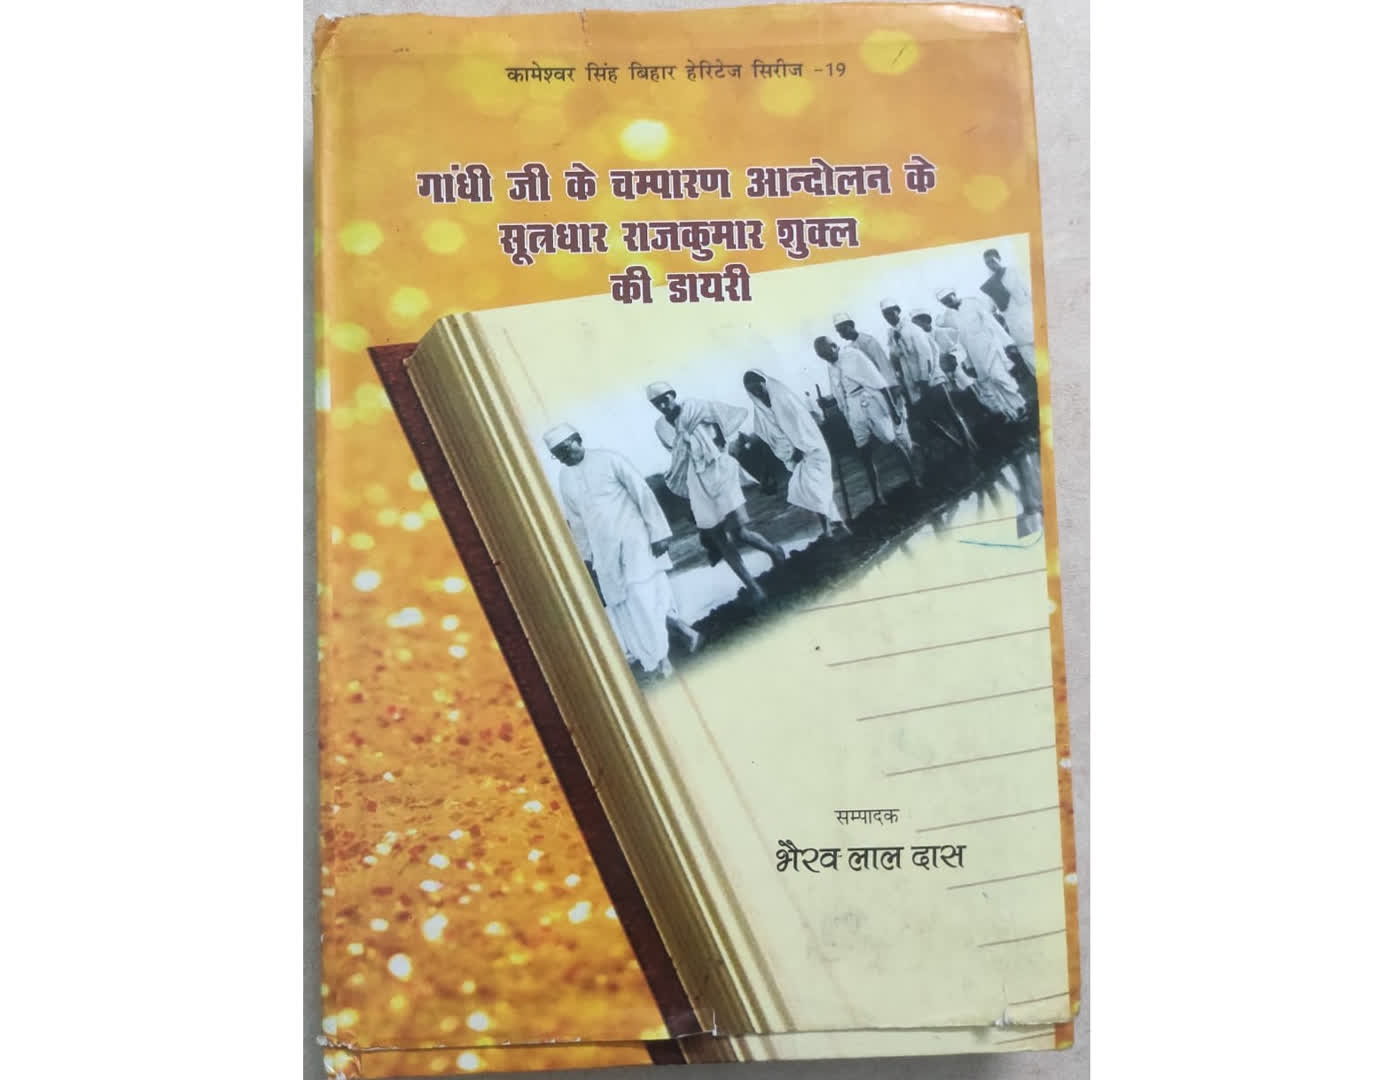 Cover of book written by Bhairav Lal Das, titled Gandhi ji Ke Champaran Andolan Ke Sutradhar Raj Kumar Shukl Ki Diary